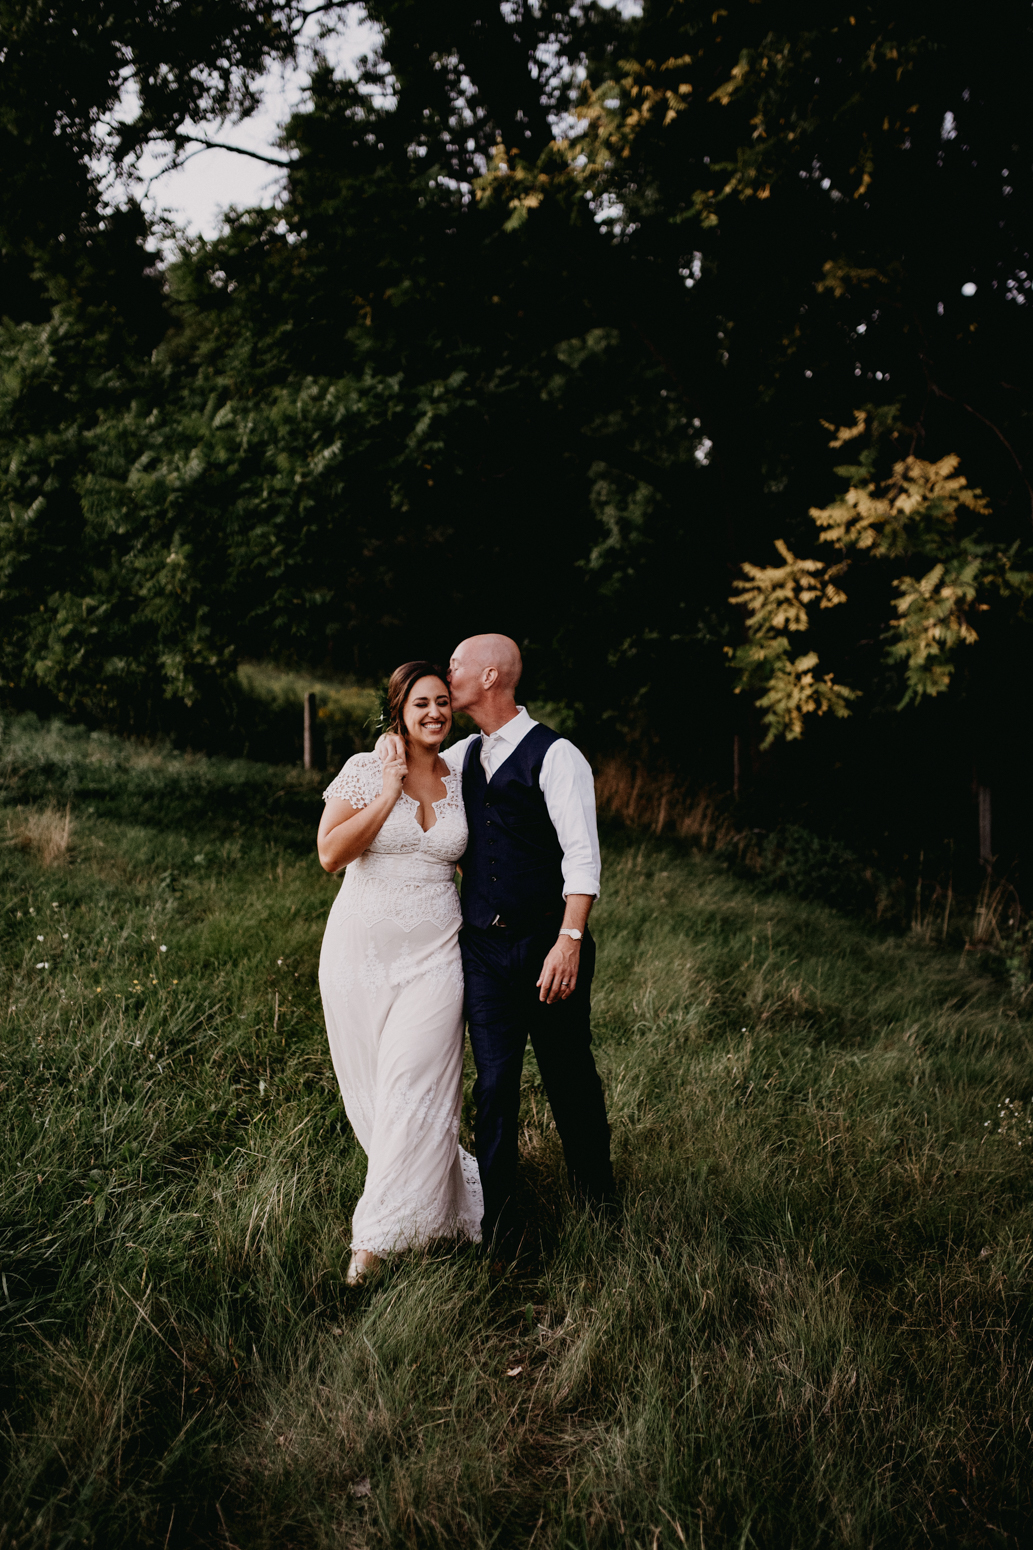 Rochester, NY Wedding Photographer (122 of 133).jpg